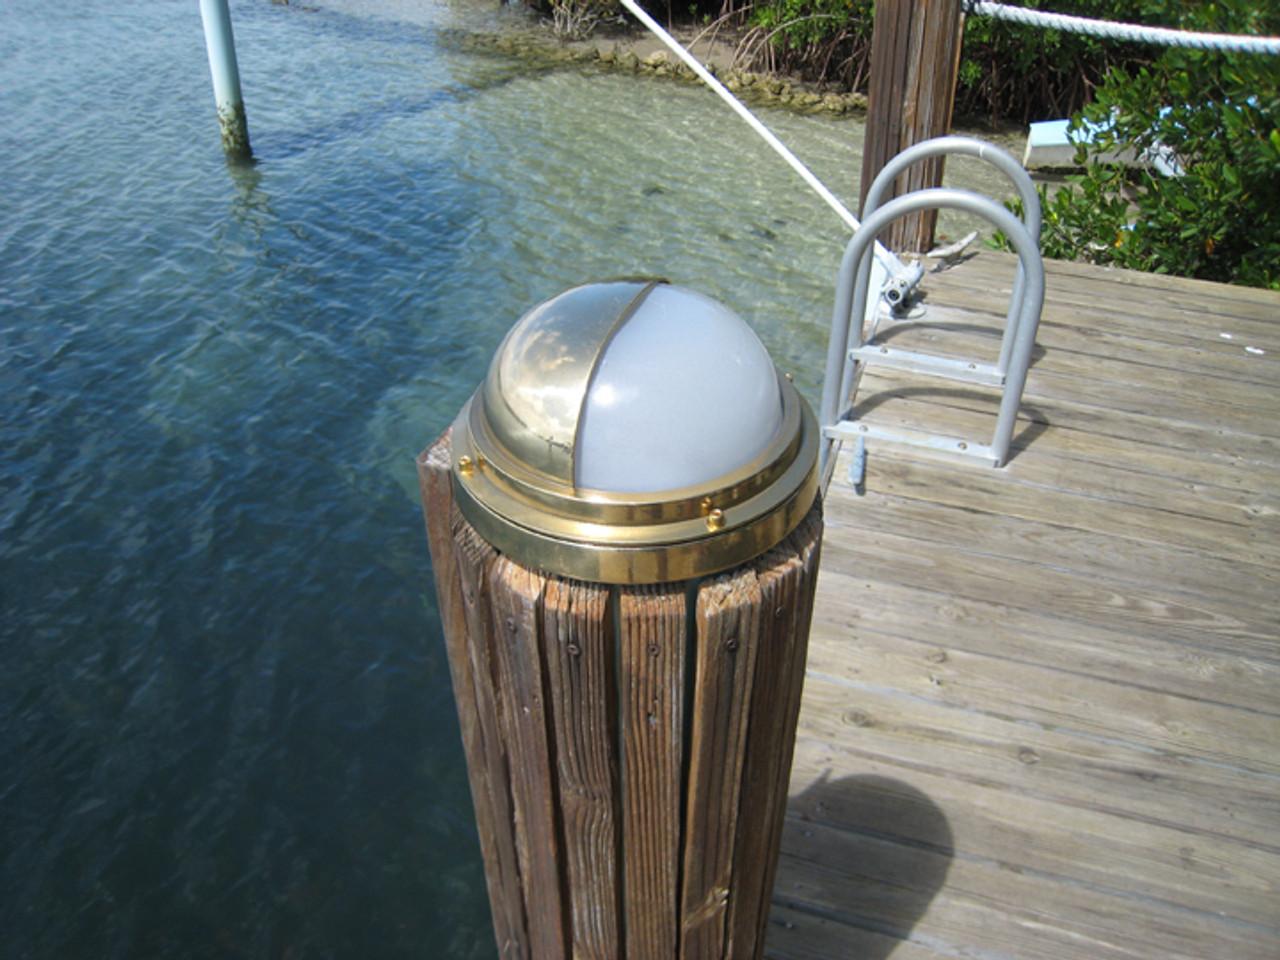 brass nautical hooded dock light